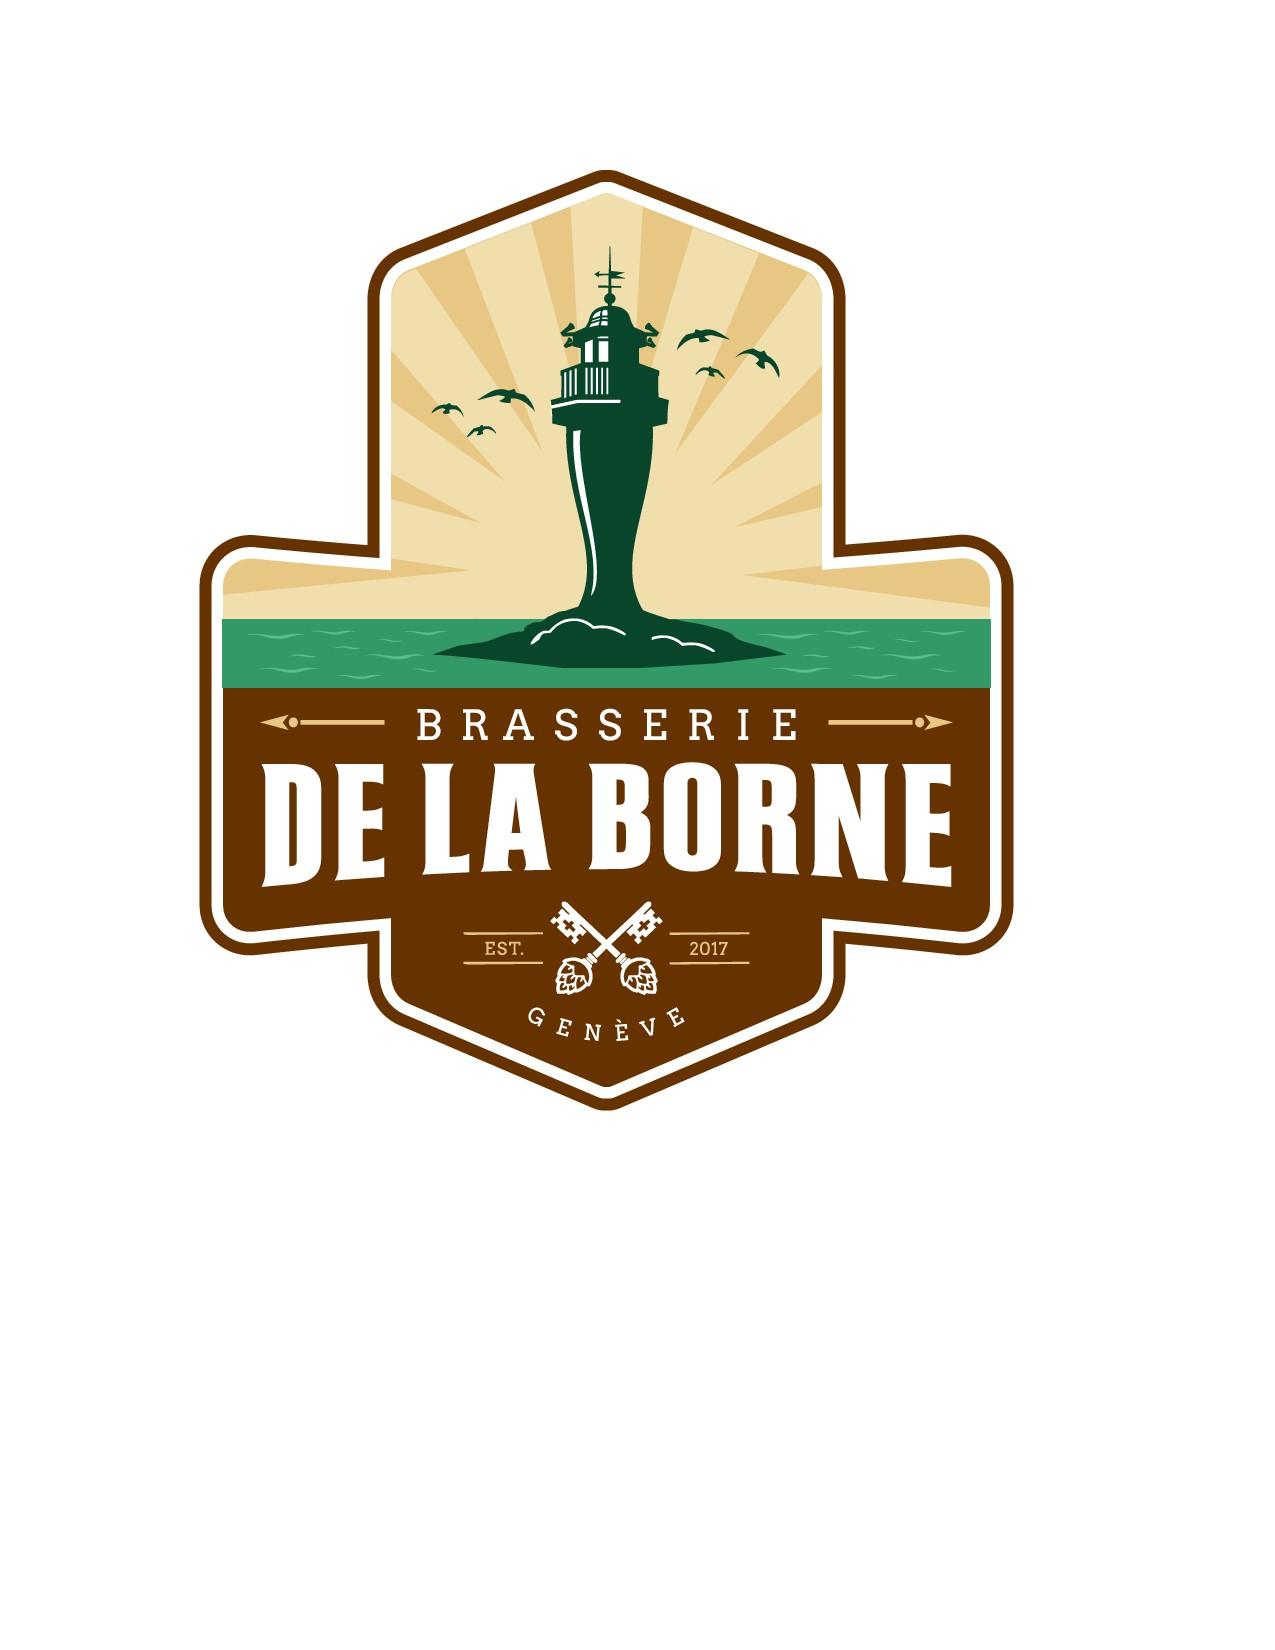 New craft Brewery need a kickass logo